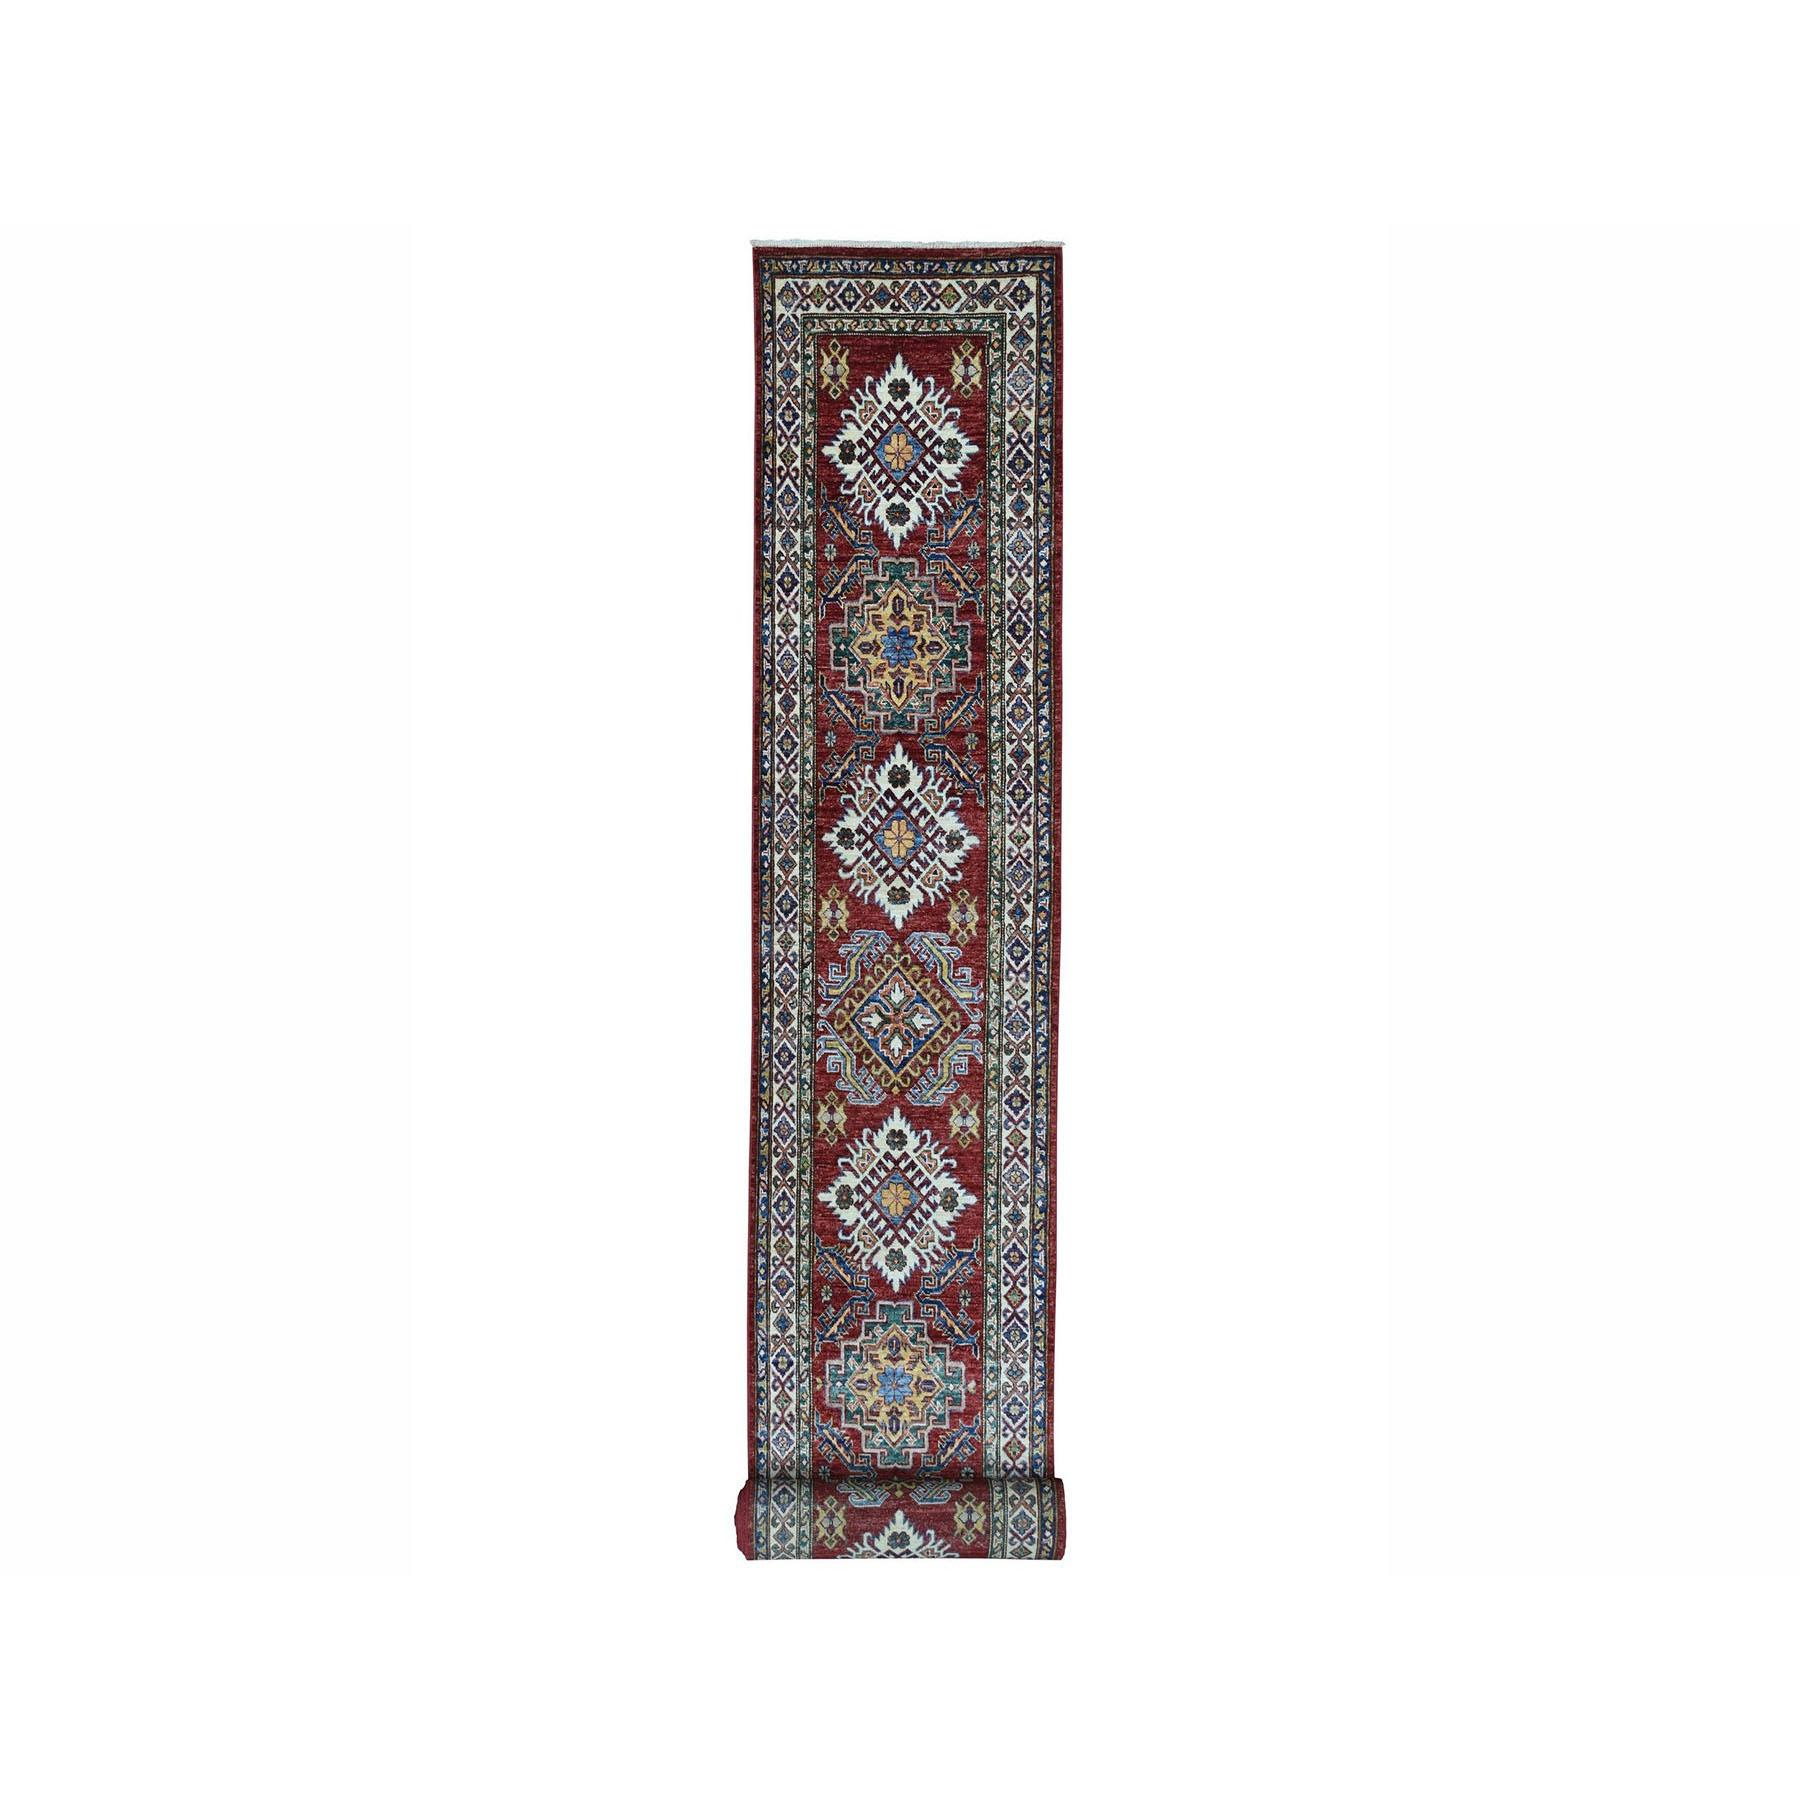 "2'8""X20' Super Kazak Red Geometric Design Pure Wool Hand-Knotted Xl Runner Oriental Rug moae0069"